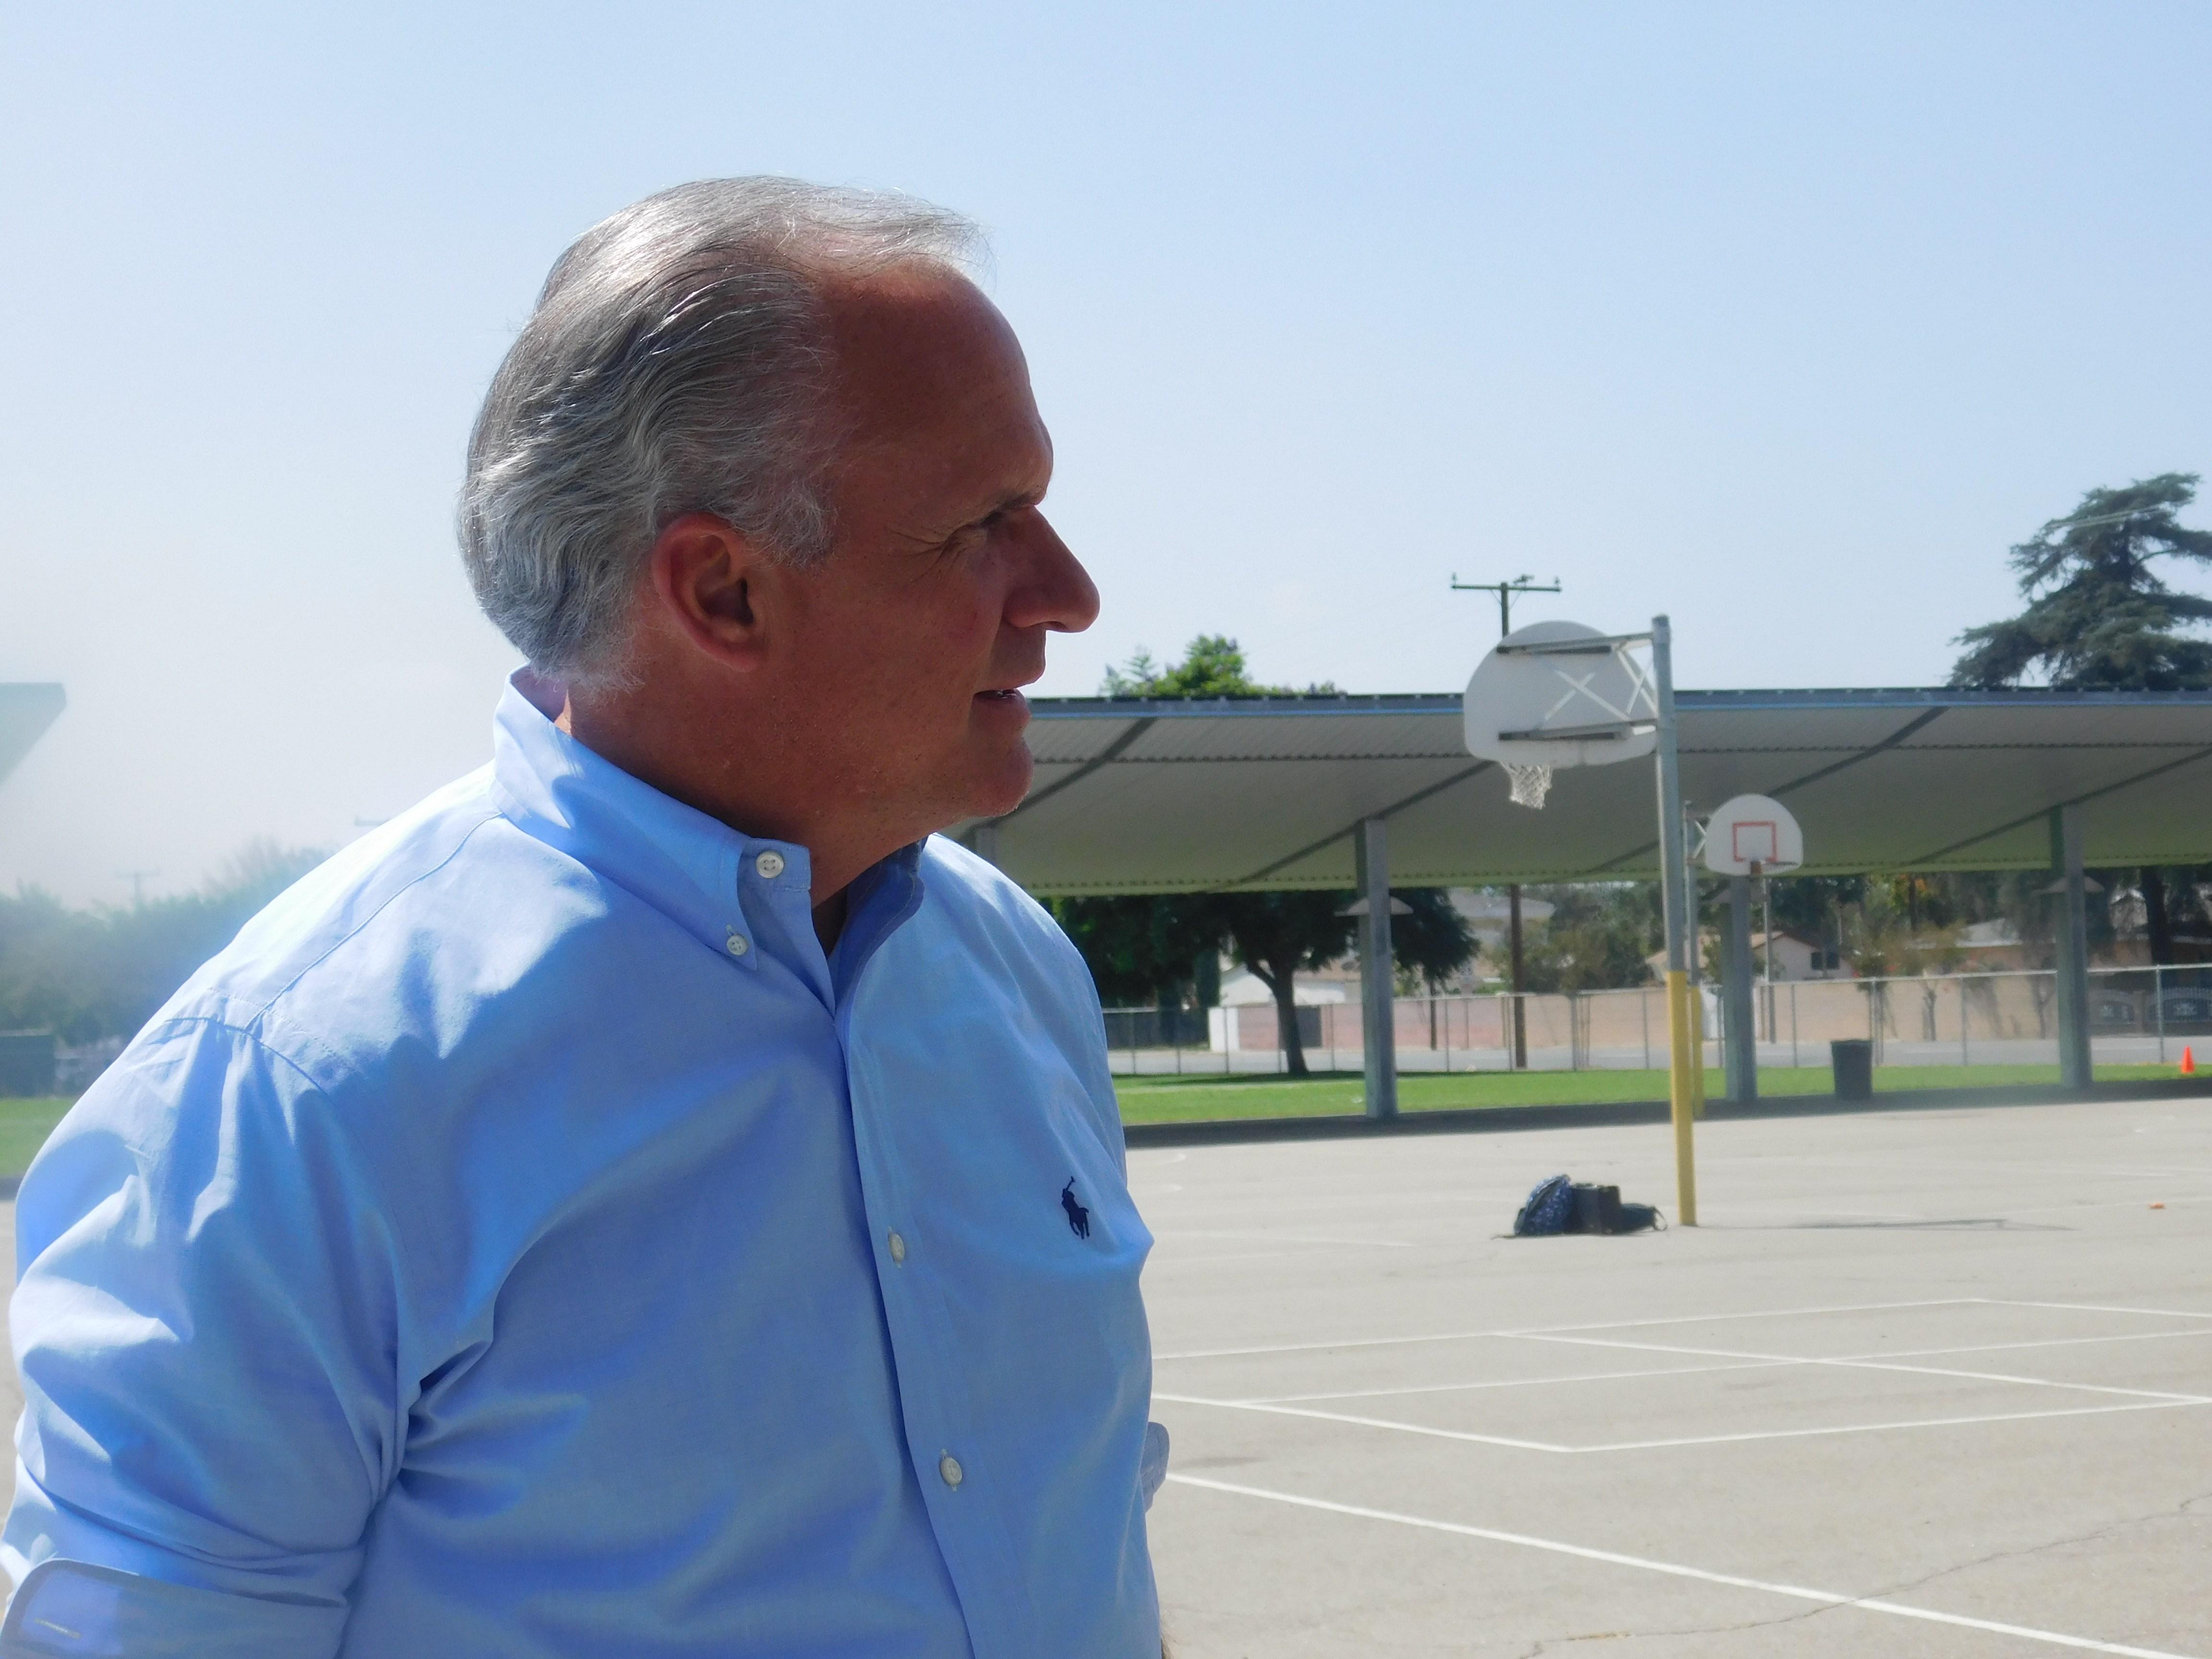 Holland's Principal